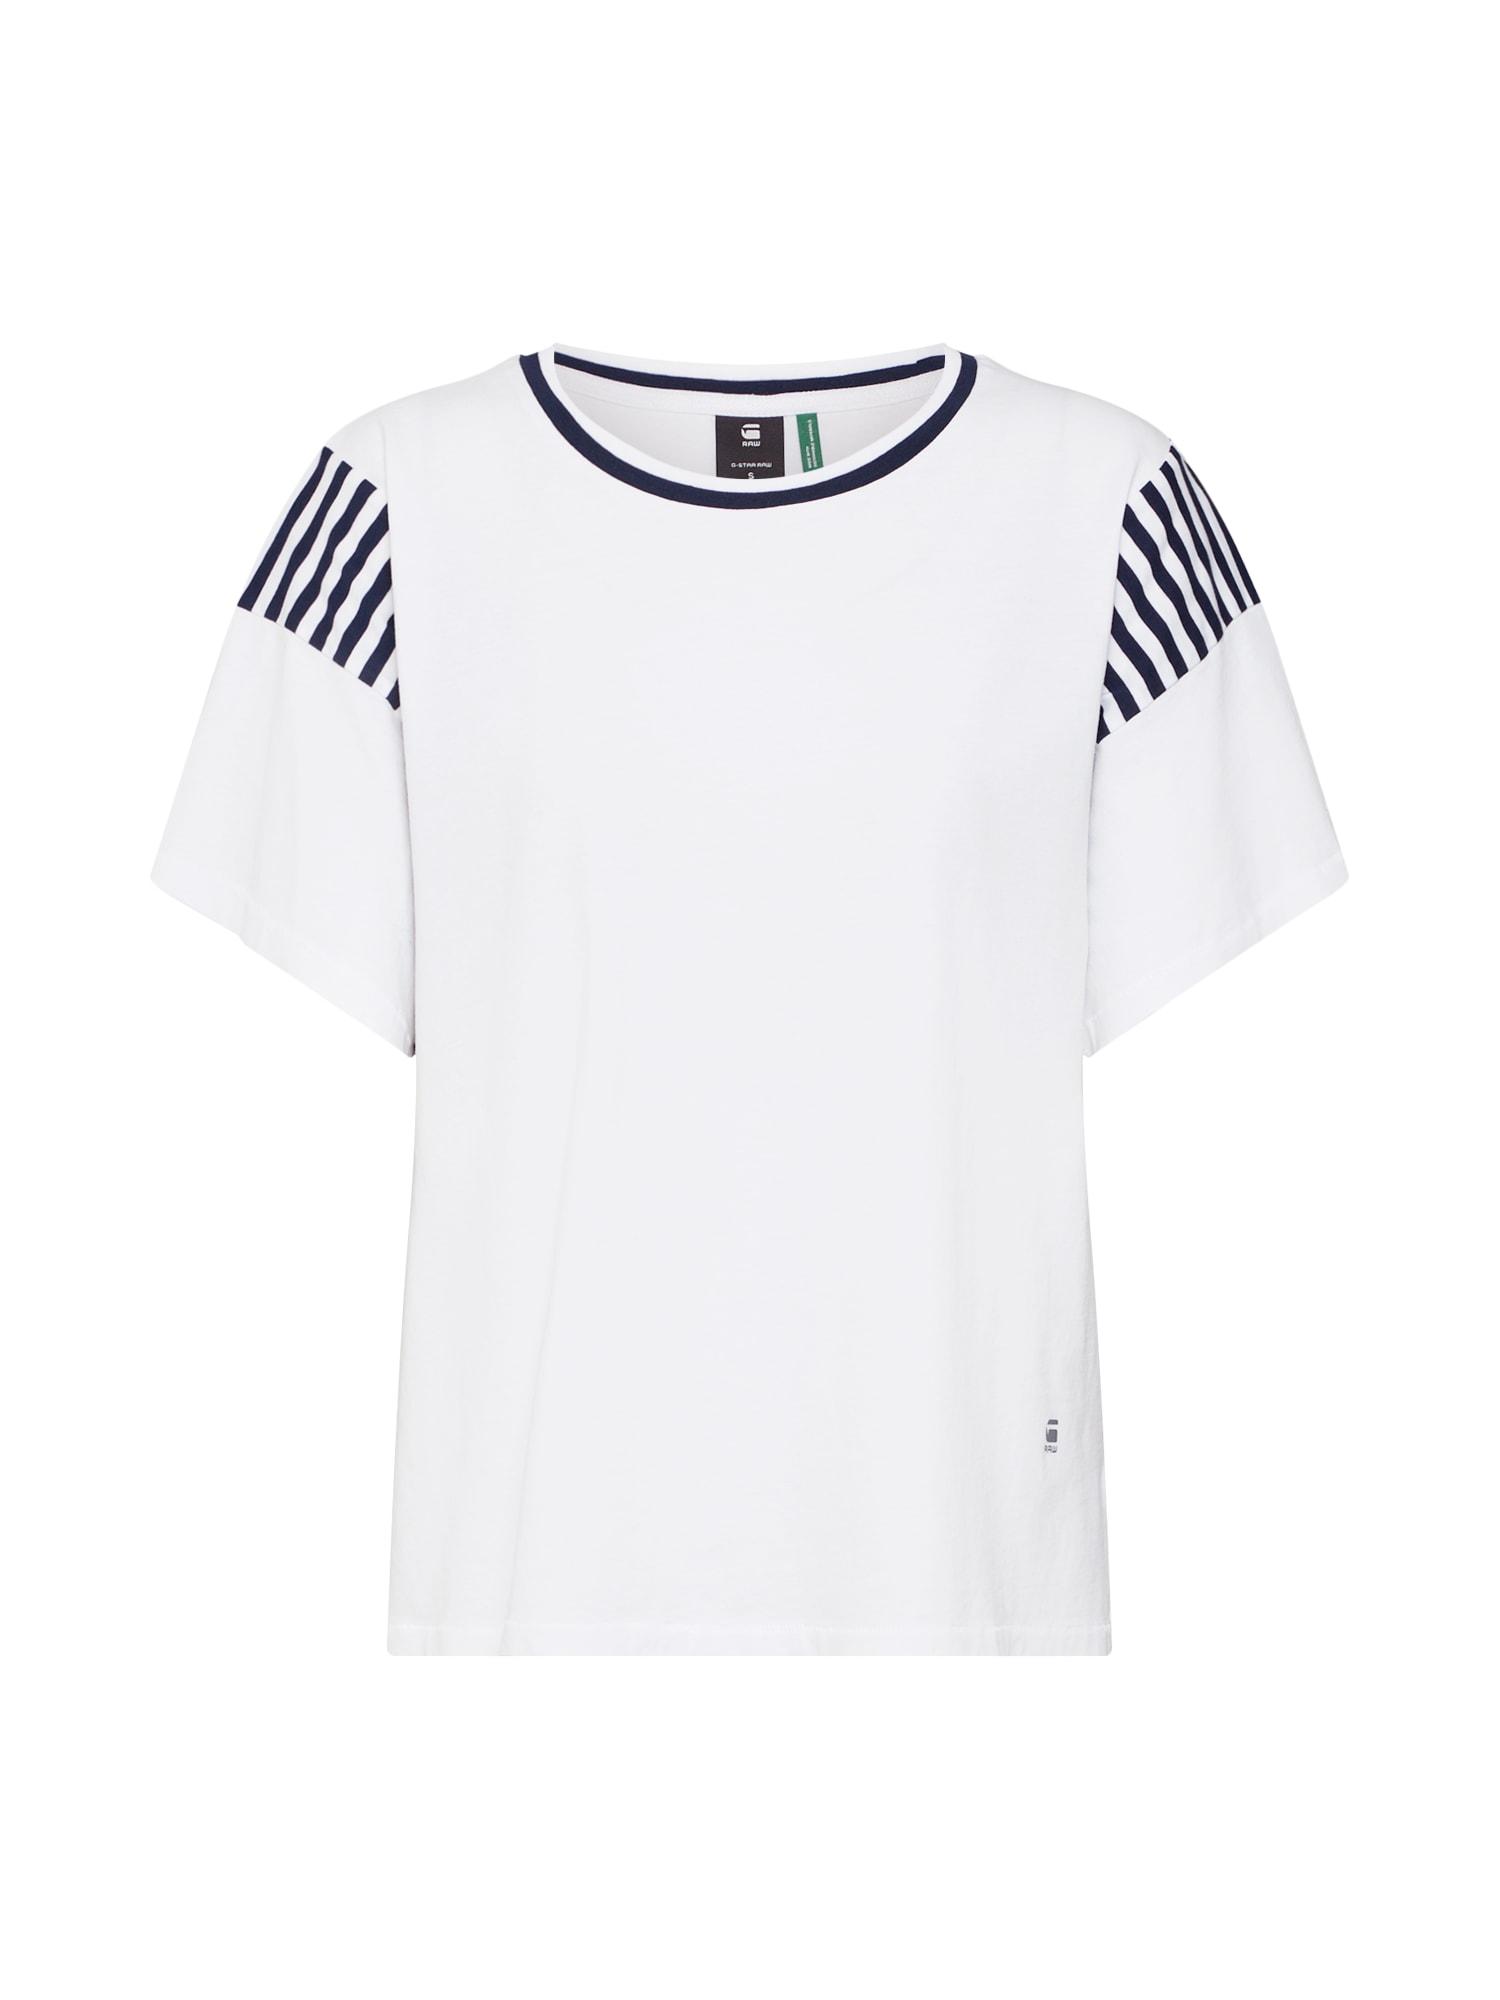 Tričko Norcia loose námořnická modř bílá G-STAR RAW